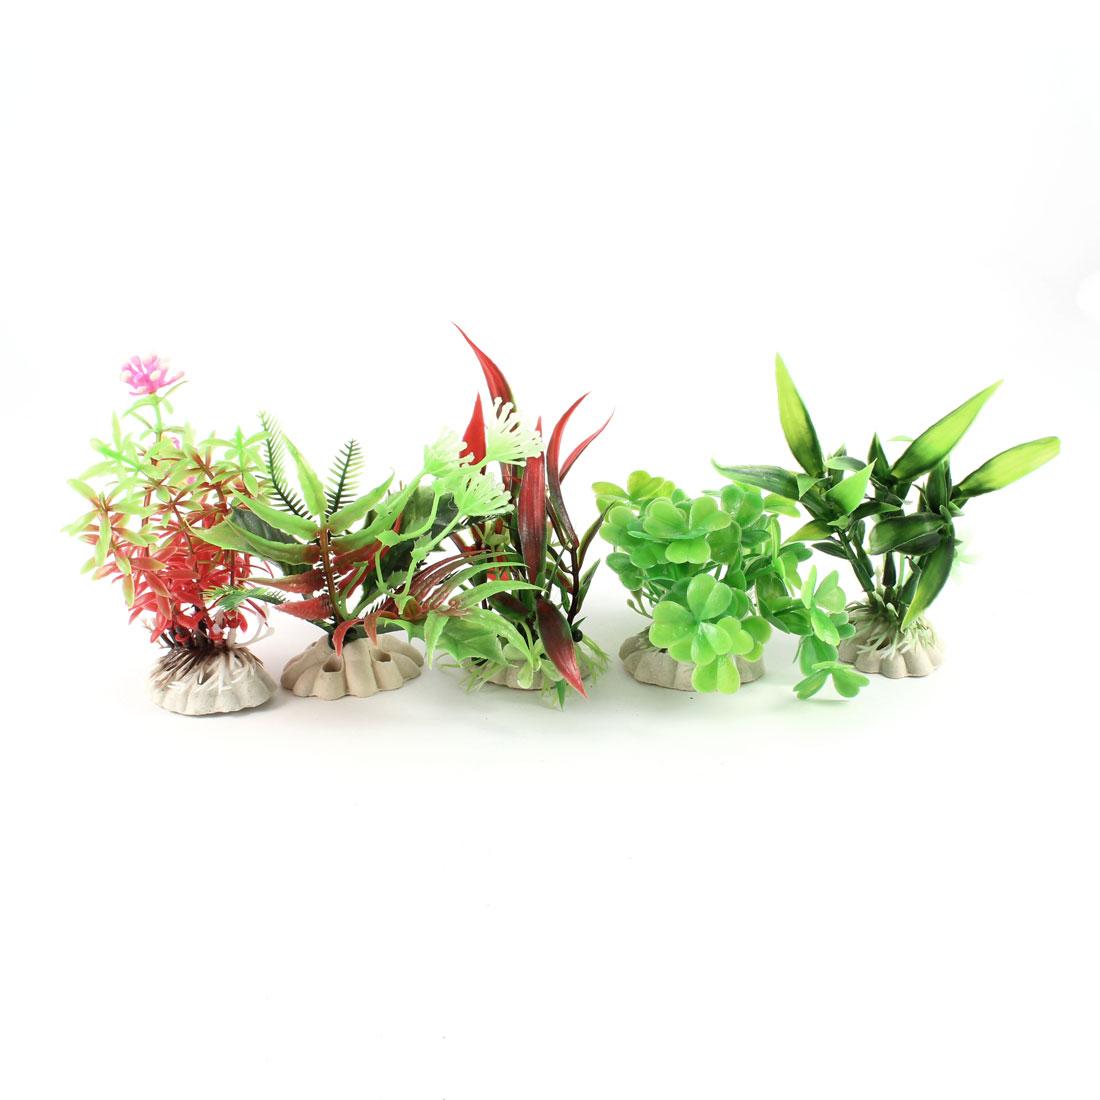 Aquarium Multi Type Green Pink Dark Red Plastic Grass Ornament 5 Pcs